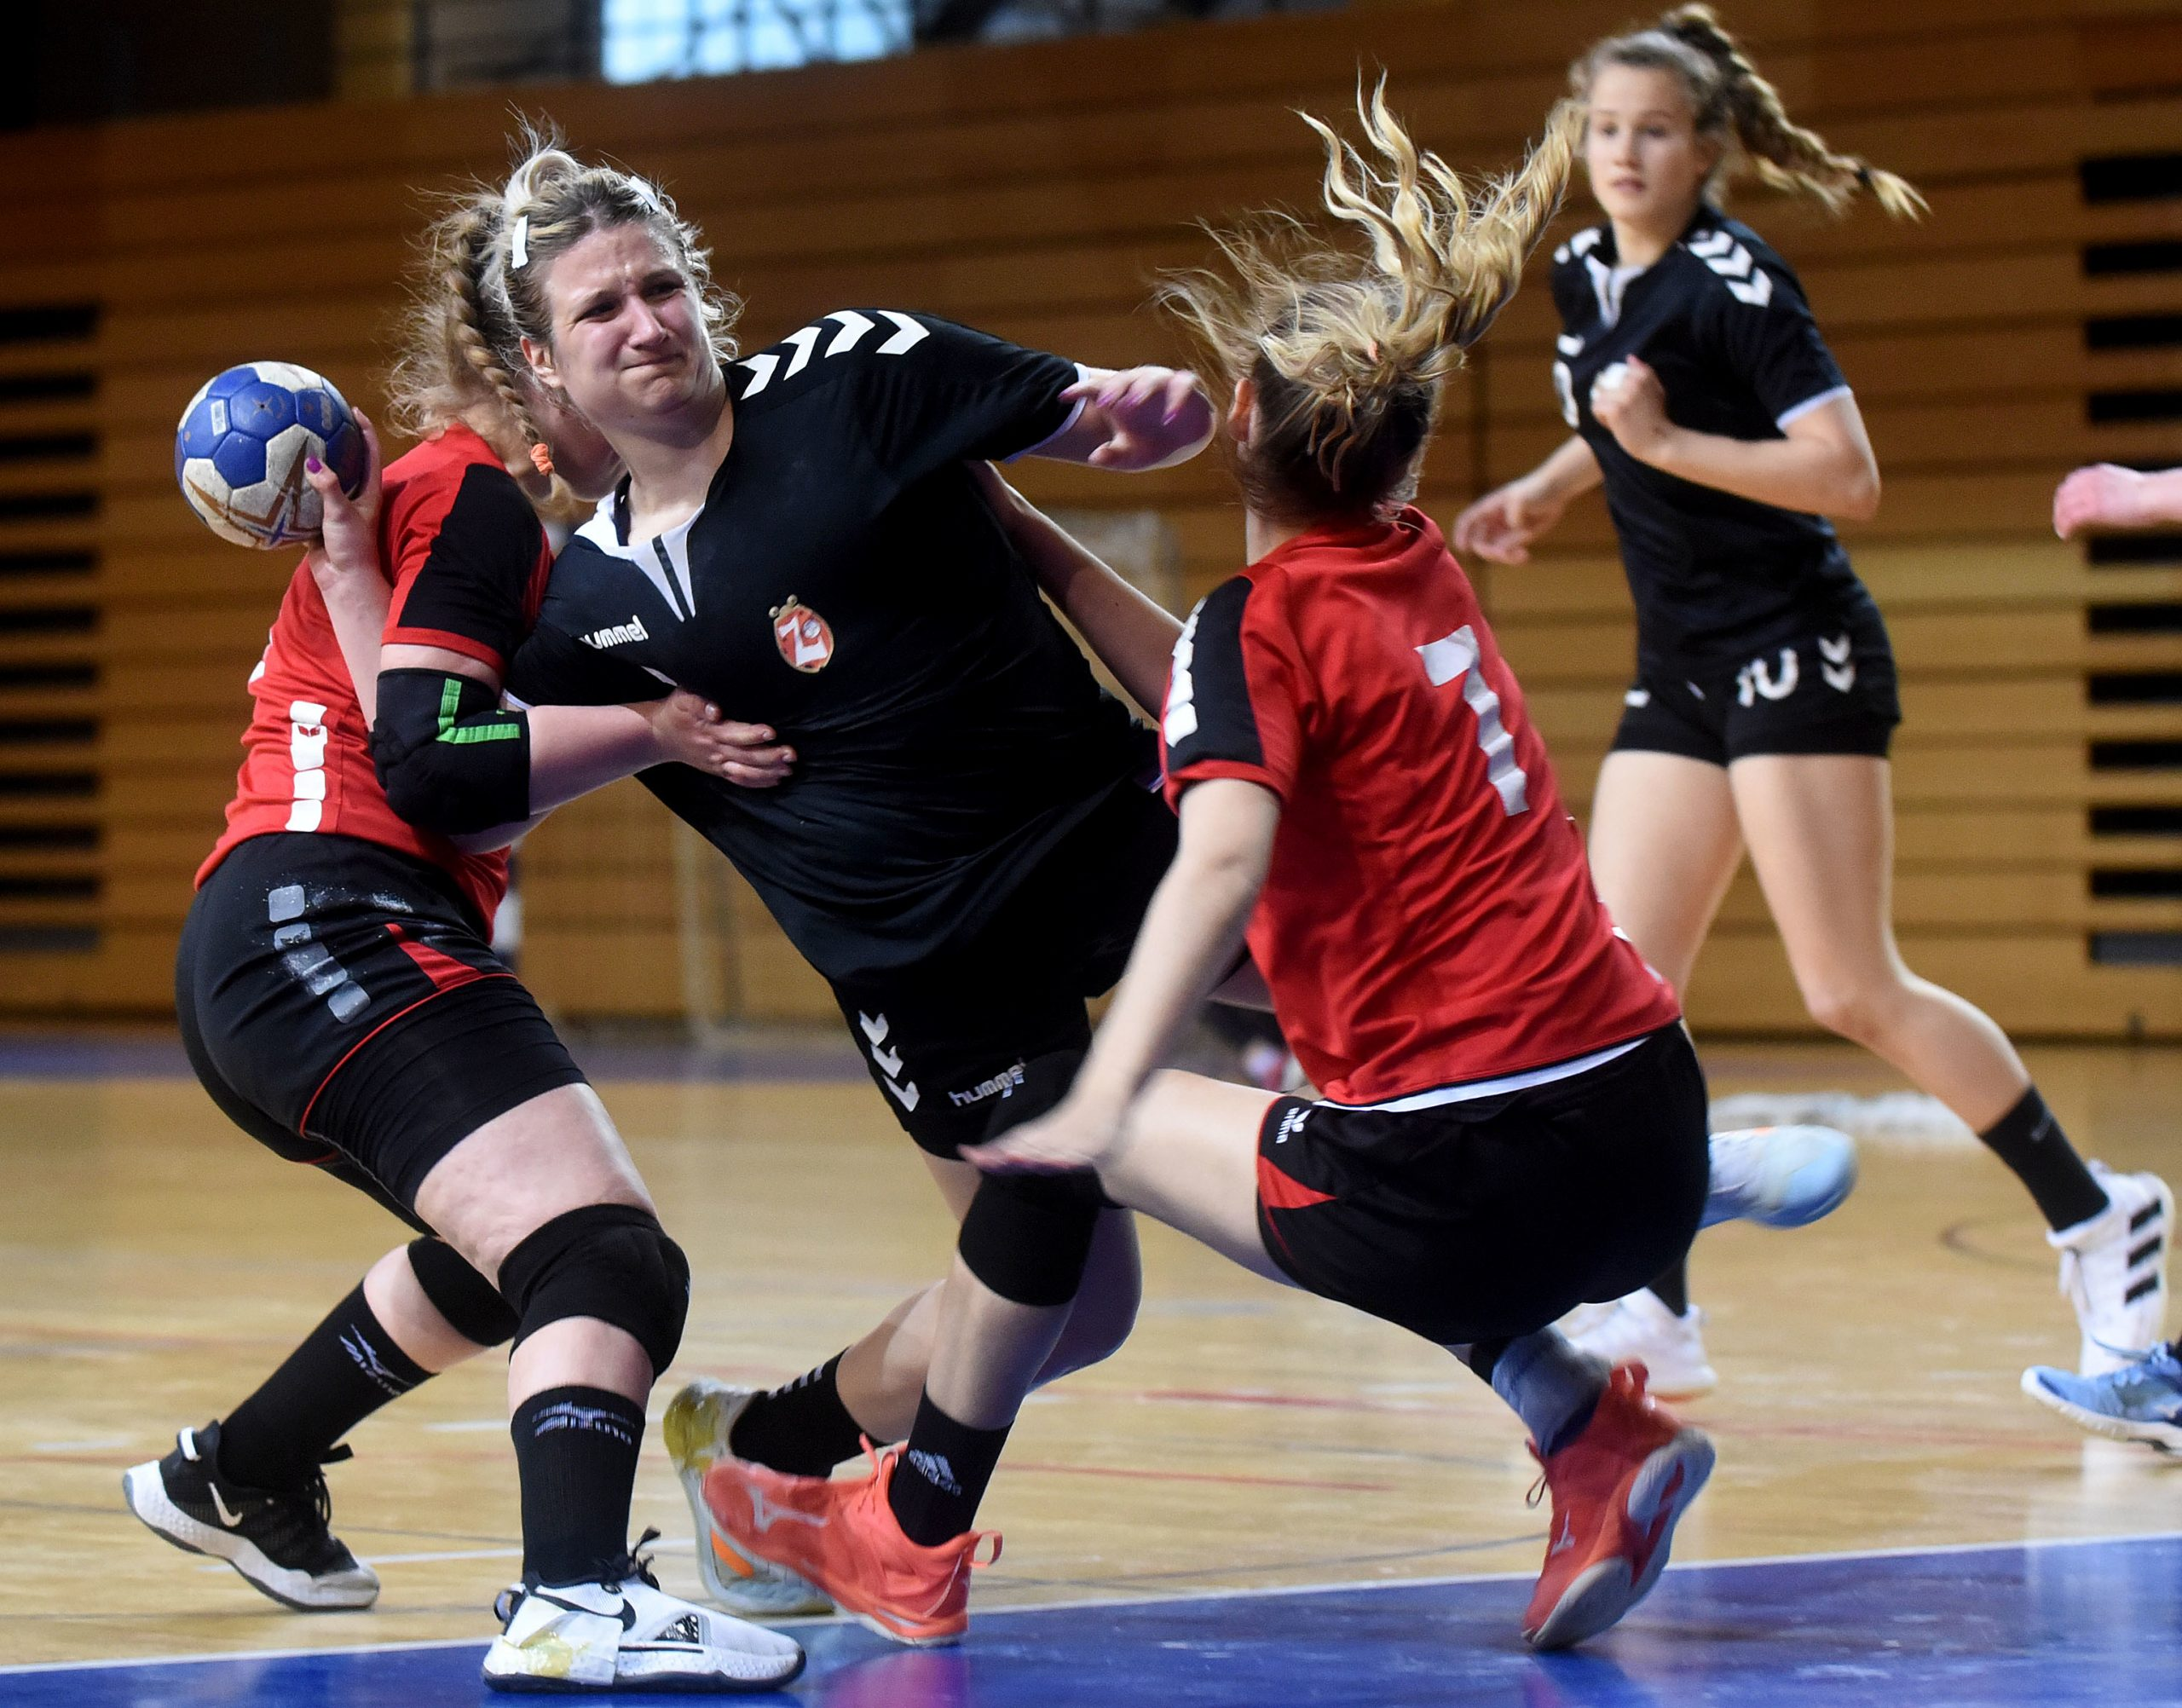 Katja Mikolić postigla je pet pogodaka protiv Opatijki/M. GRACIN